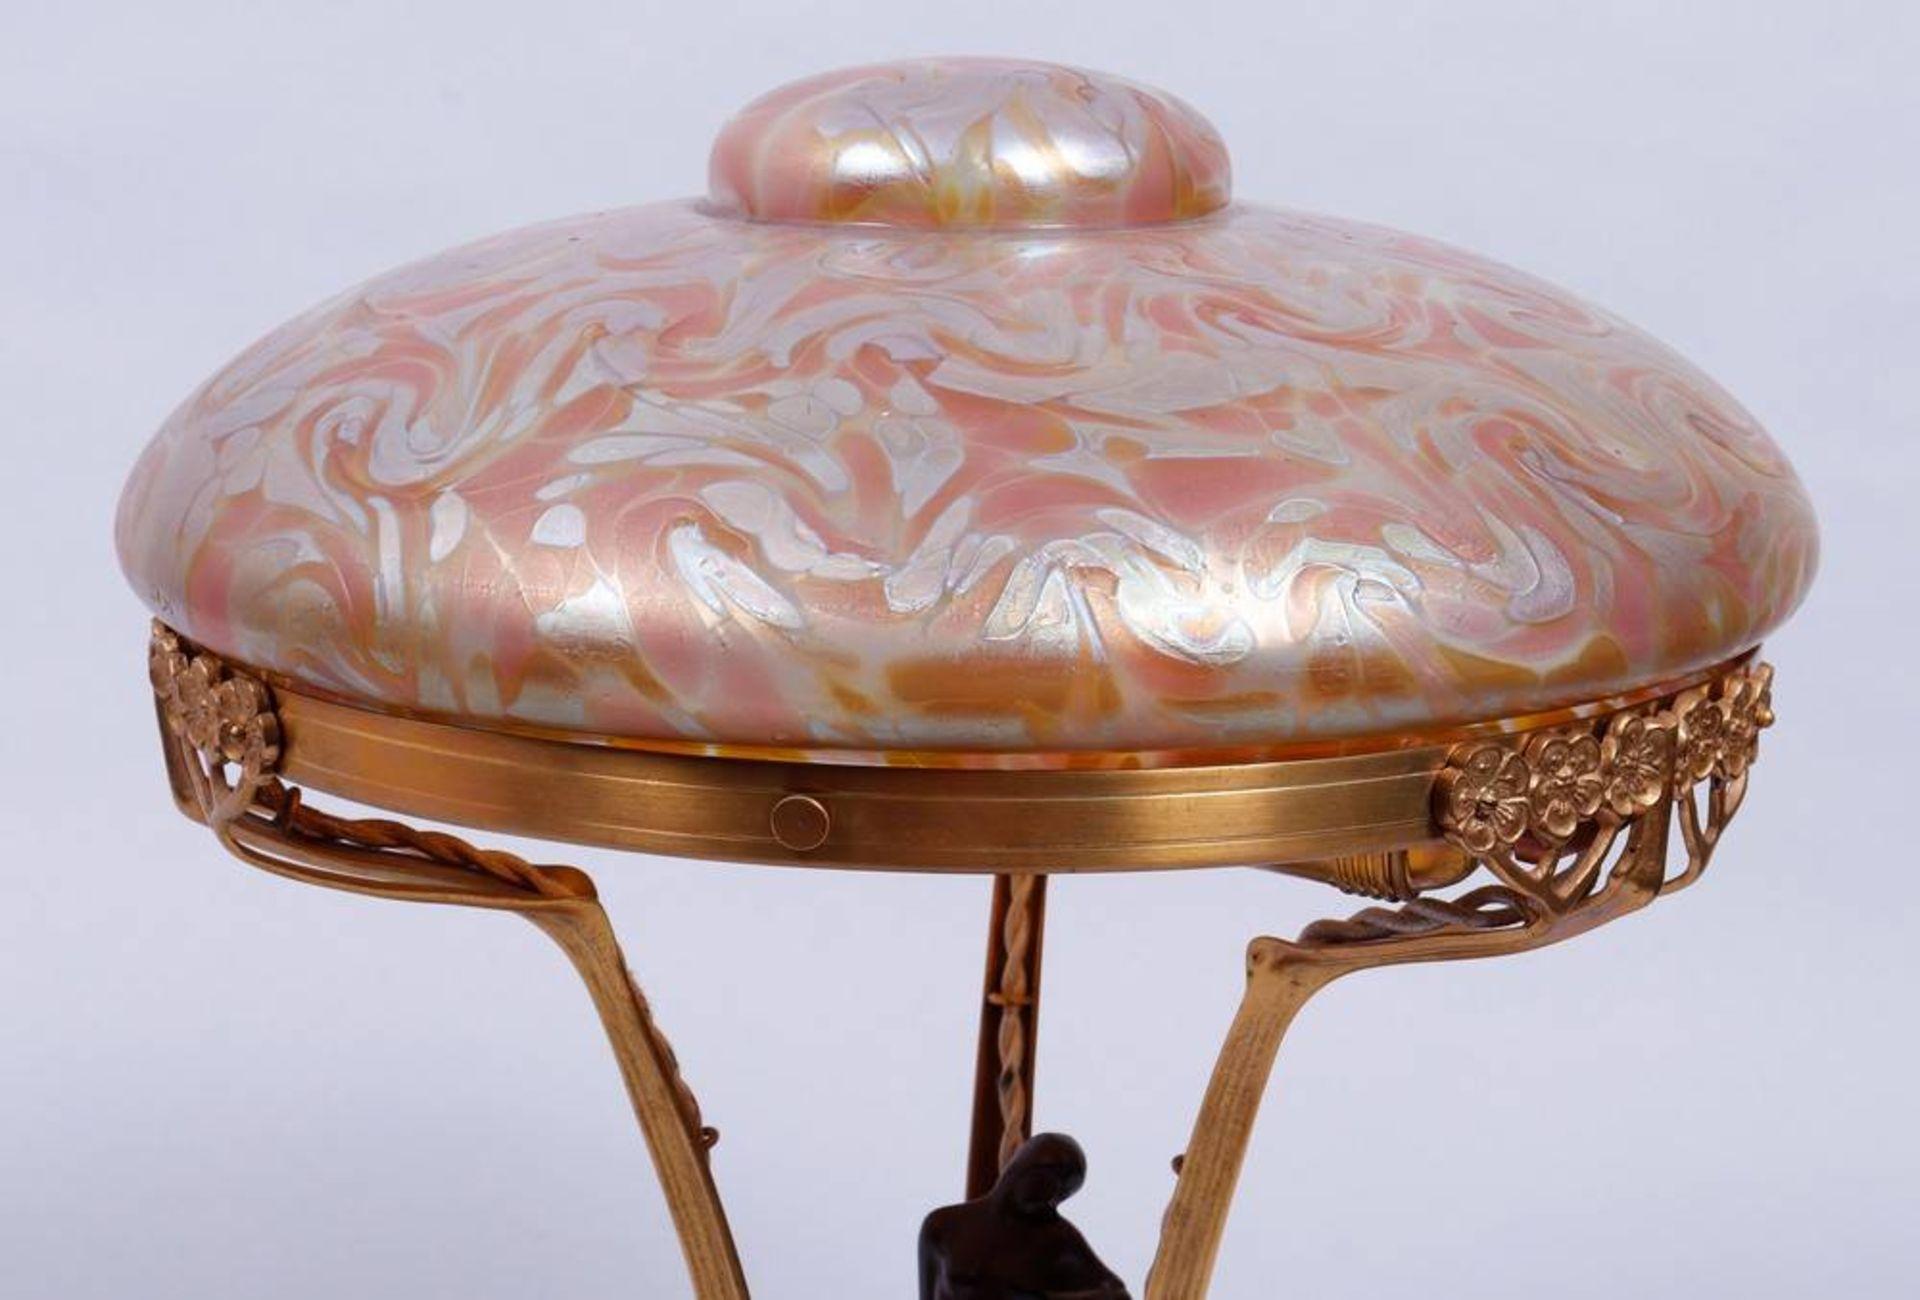 Art Nouveau table lamp, probably Loetz, 1st half 20th C. - Image 4 of 6